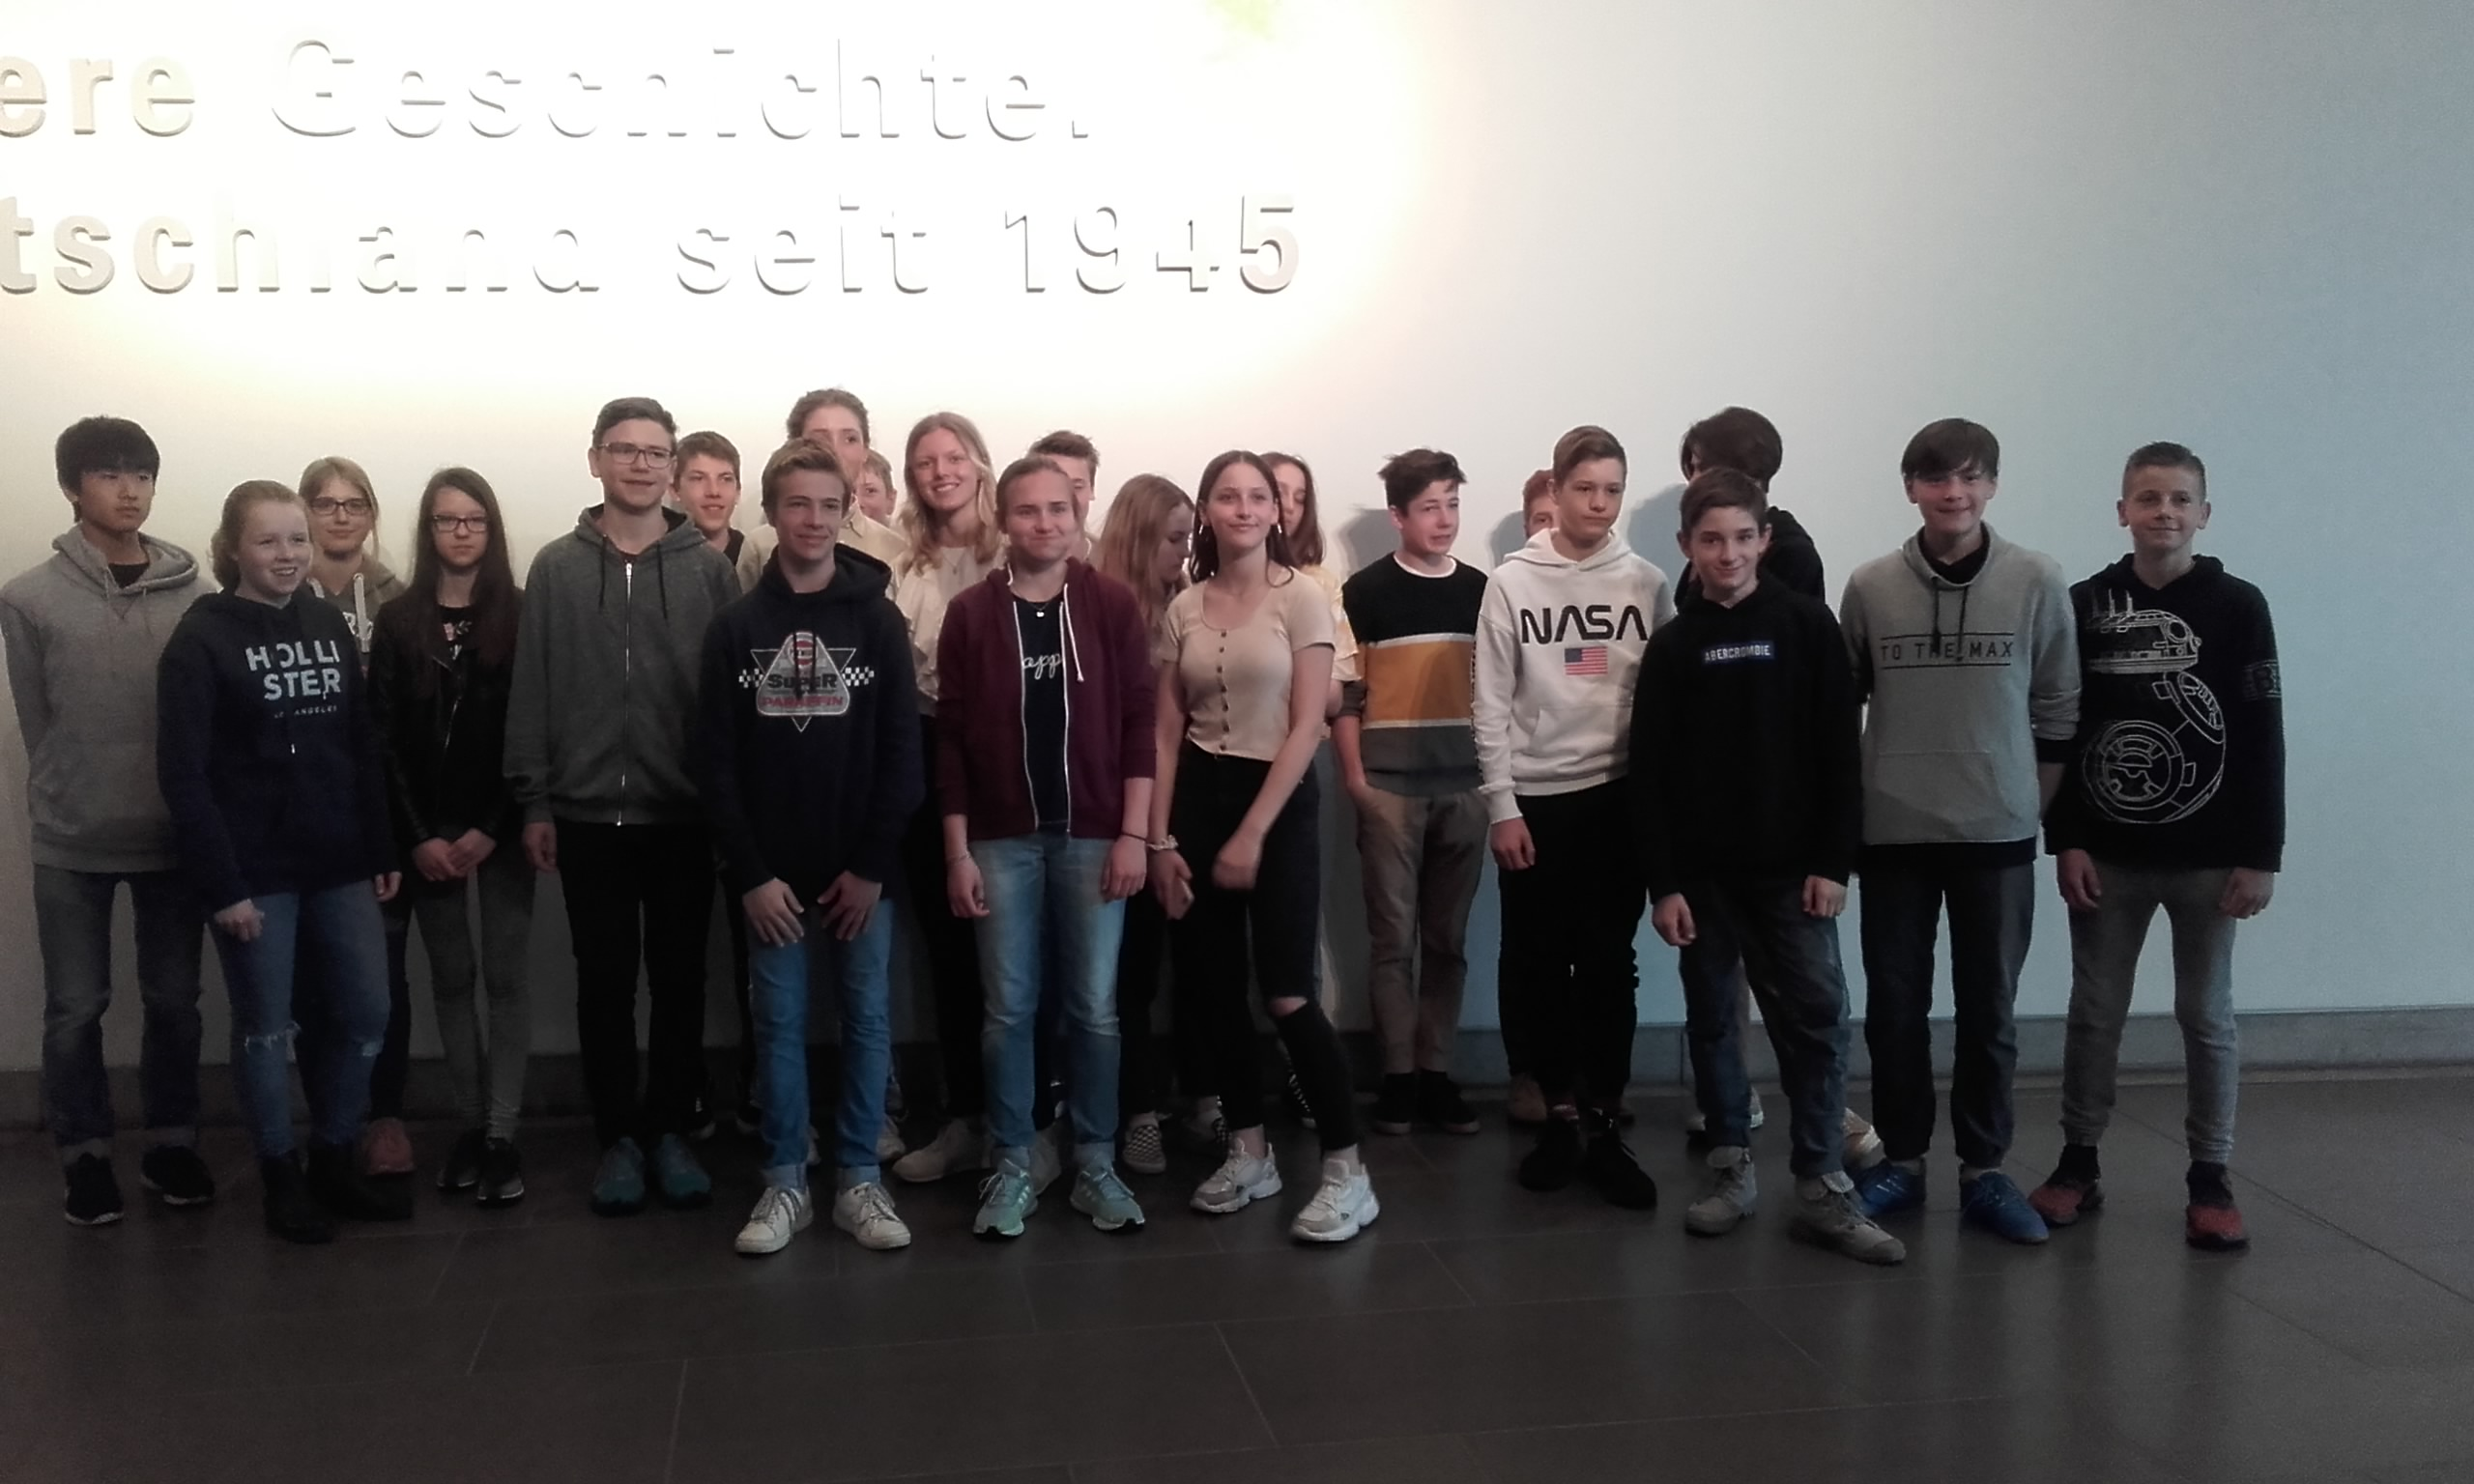 Muzeum historii w Bonn